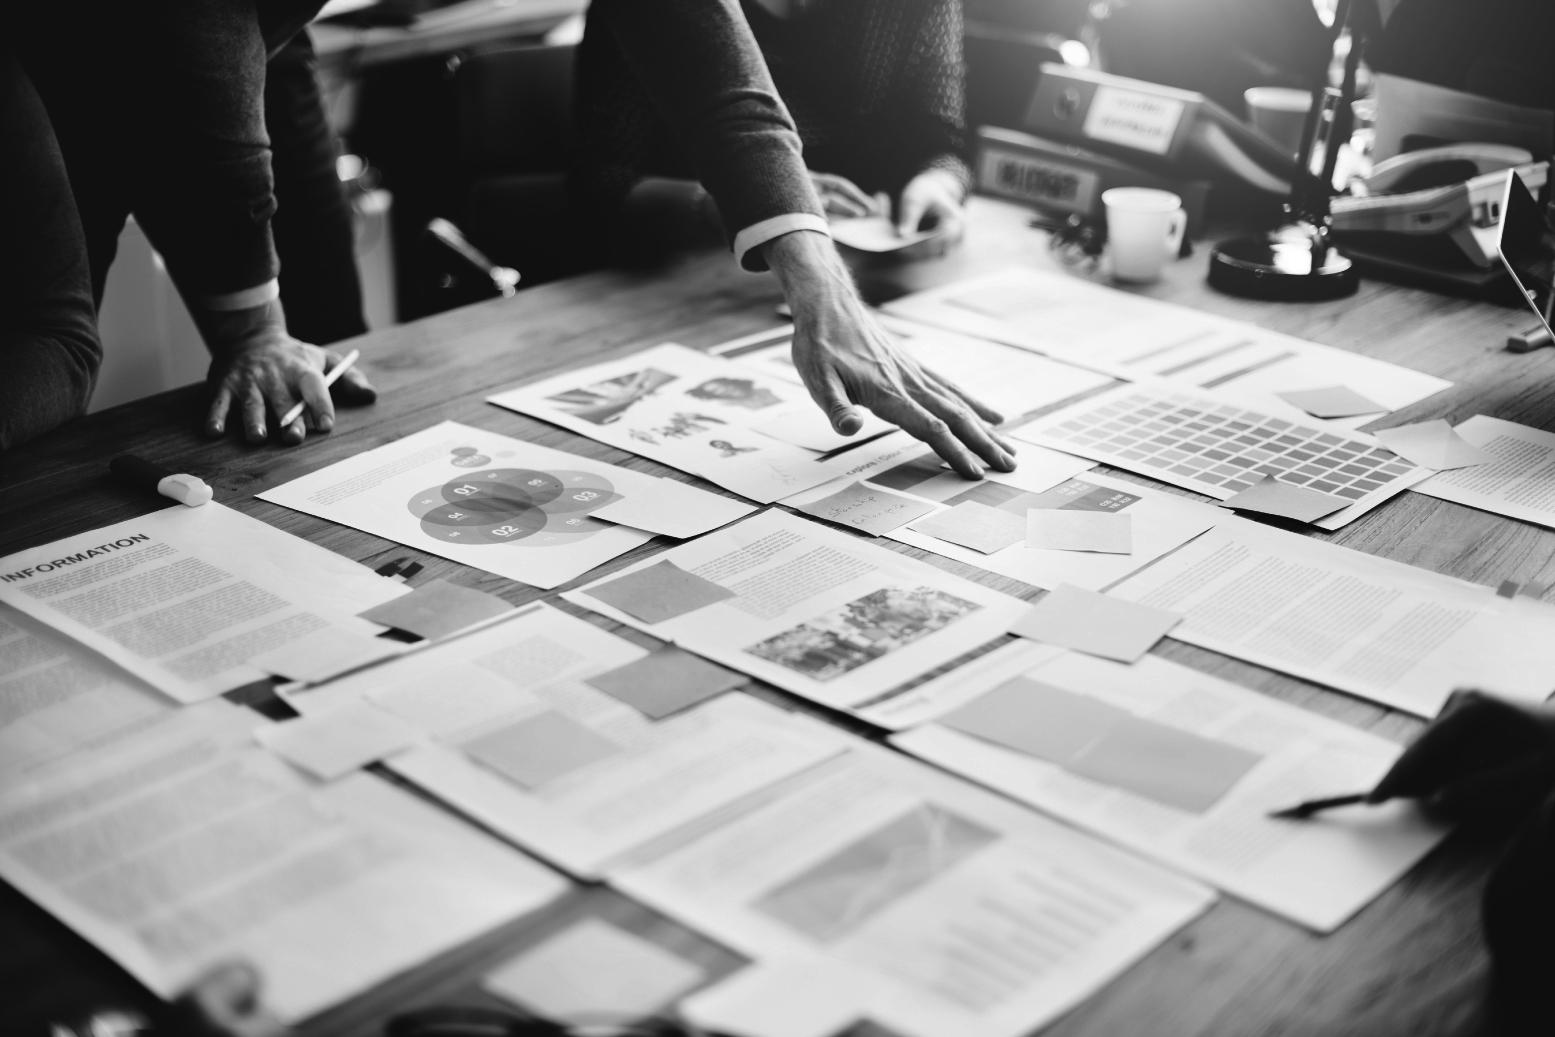 web-design-process-madison-ms-barndance-creative